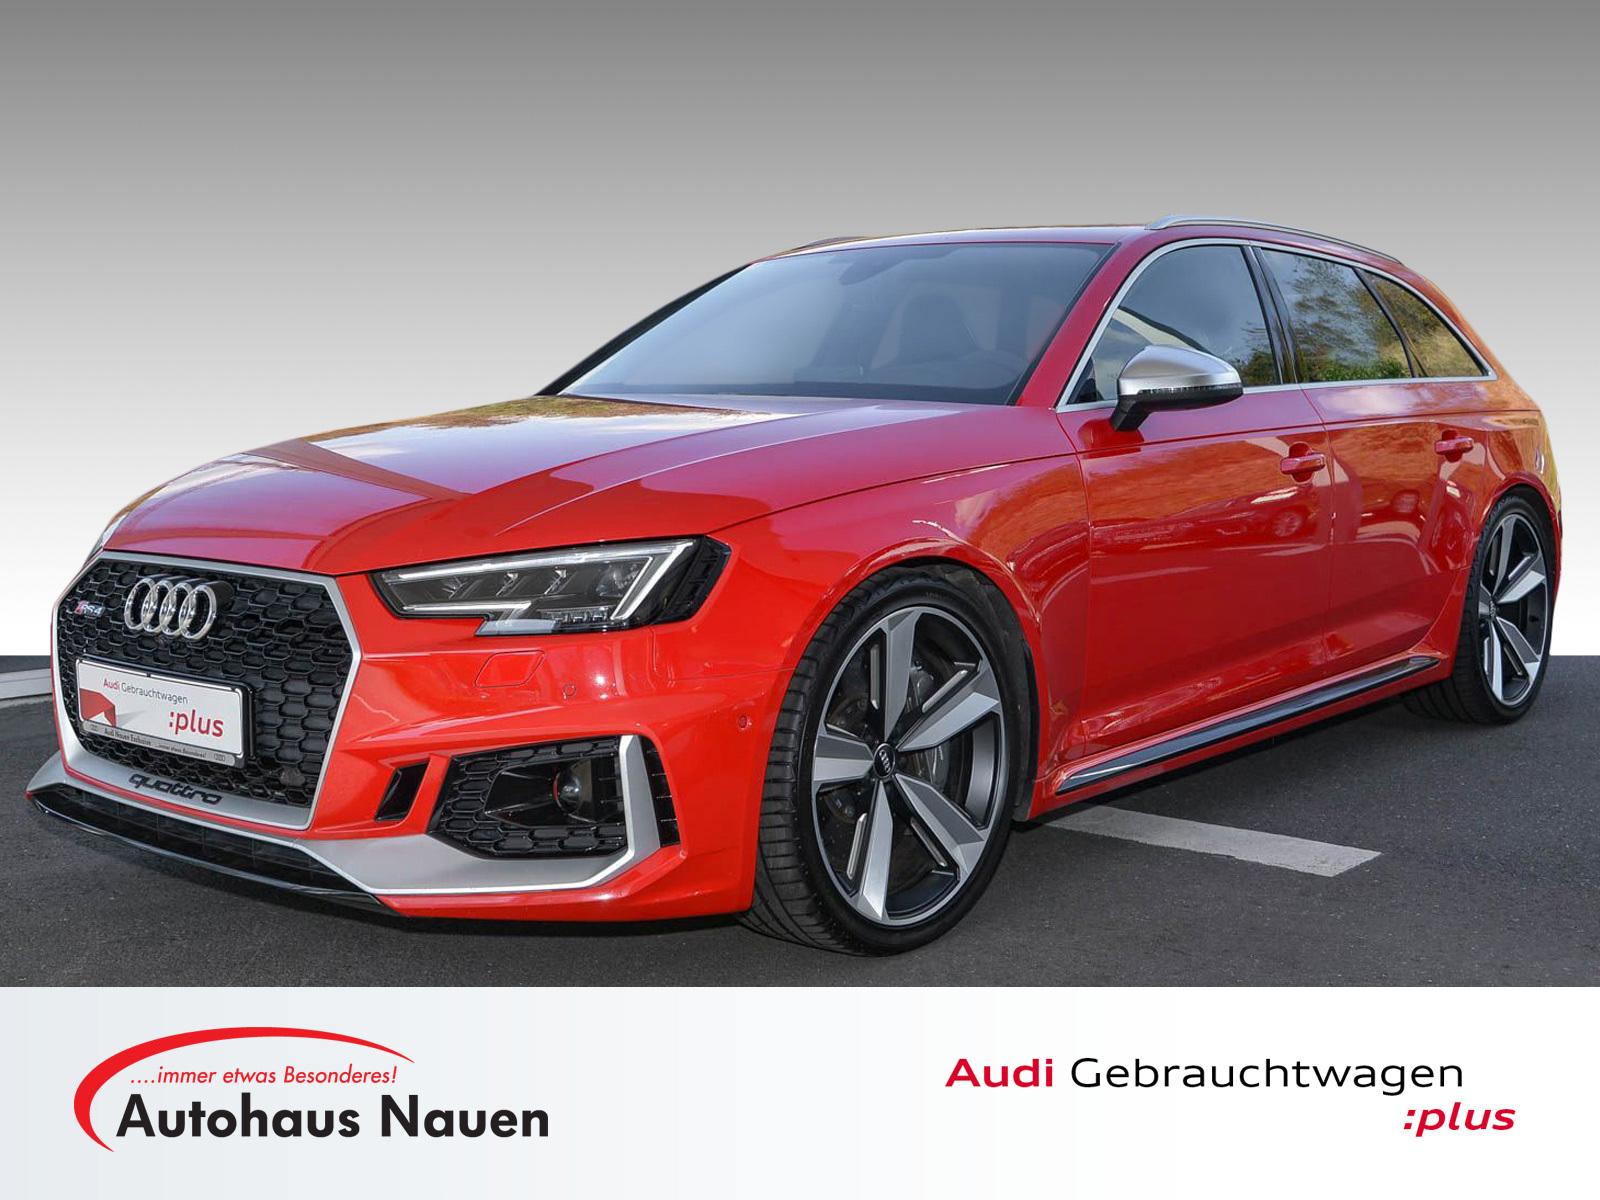 Audi RS 4 Avant 2.9 TFSI quattro (Virtual Cockpit*Panoramadach) Navi Leder, Jahr 2018, Benzin